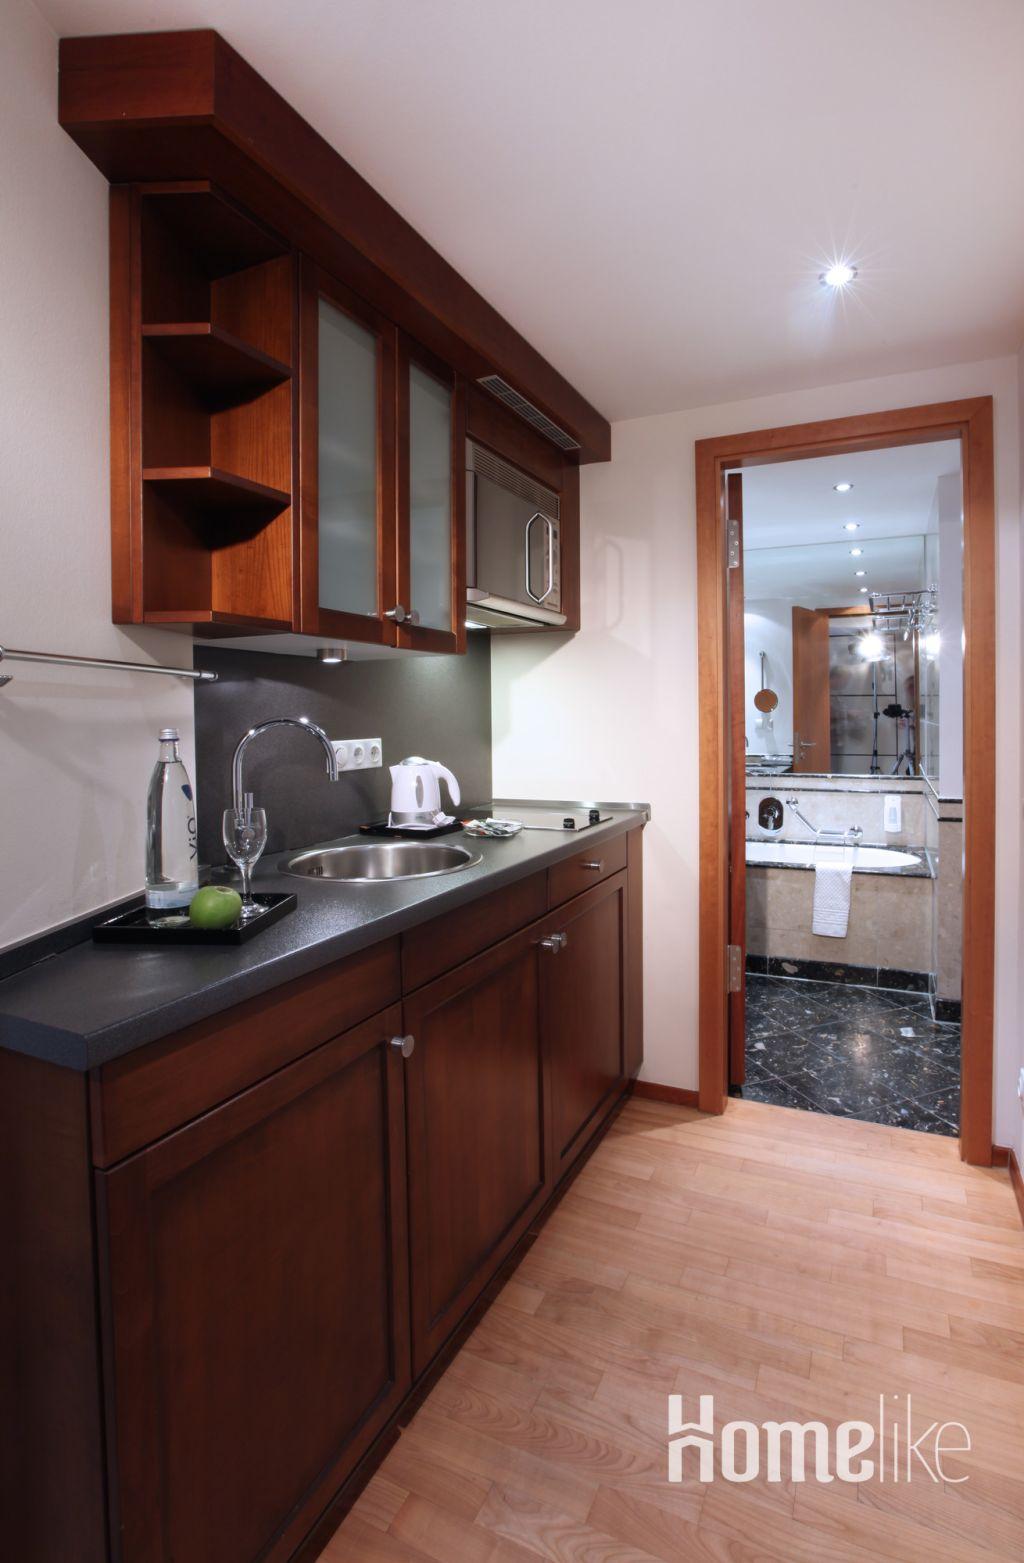 image 6 furnished 1 bedroom Apartment for rent in Sachsenhausen-Nord, Frankfurt